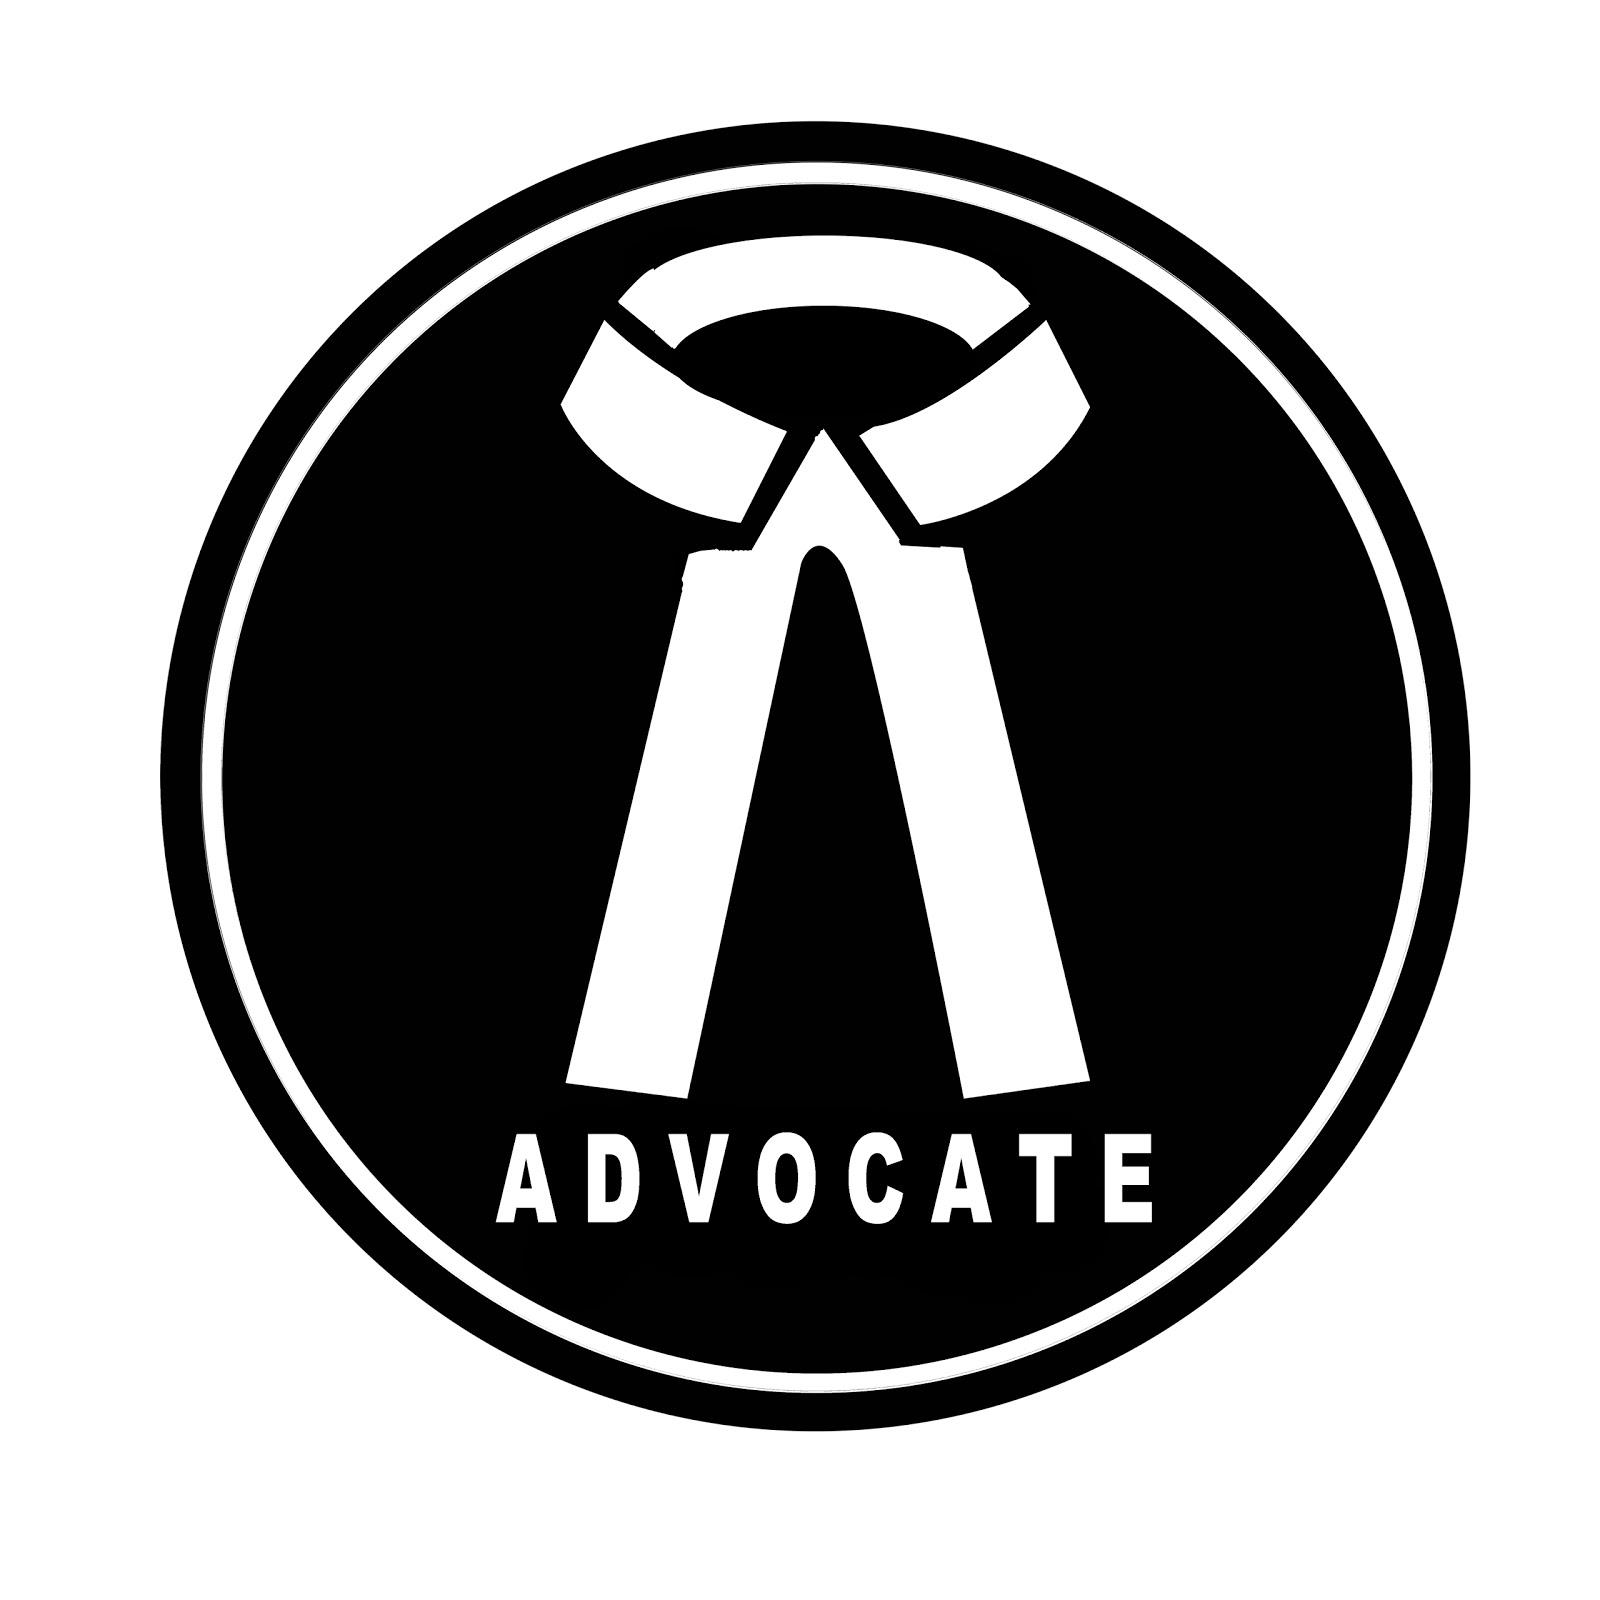 Law Logo   Law symbol   Advocate Logo L L B abbreviationIndian Advocate Logo